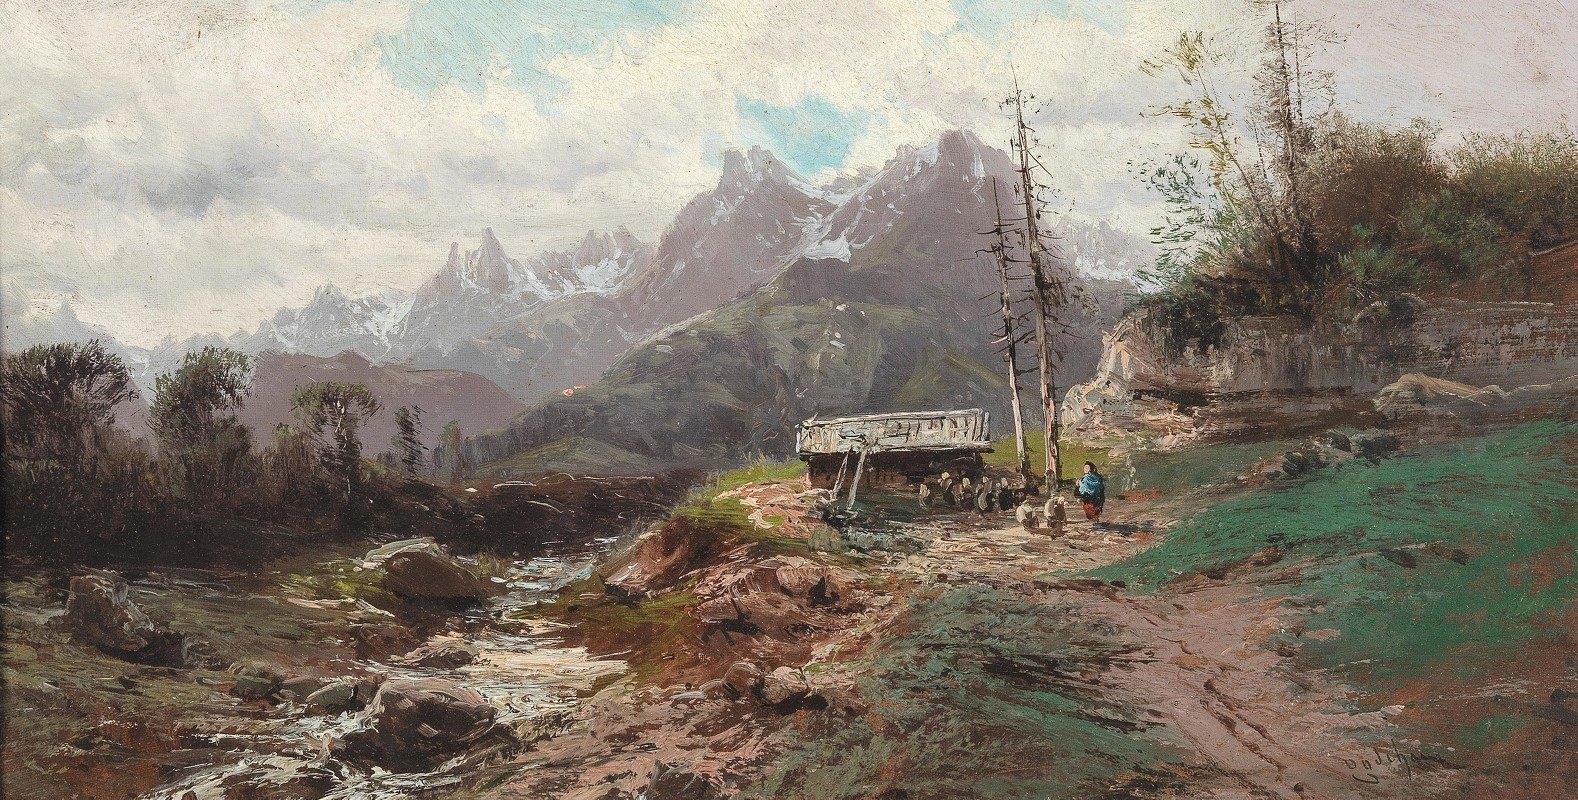 Alfred Godchaux - A Wild Mountain Landscape